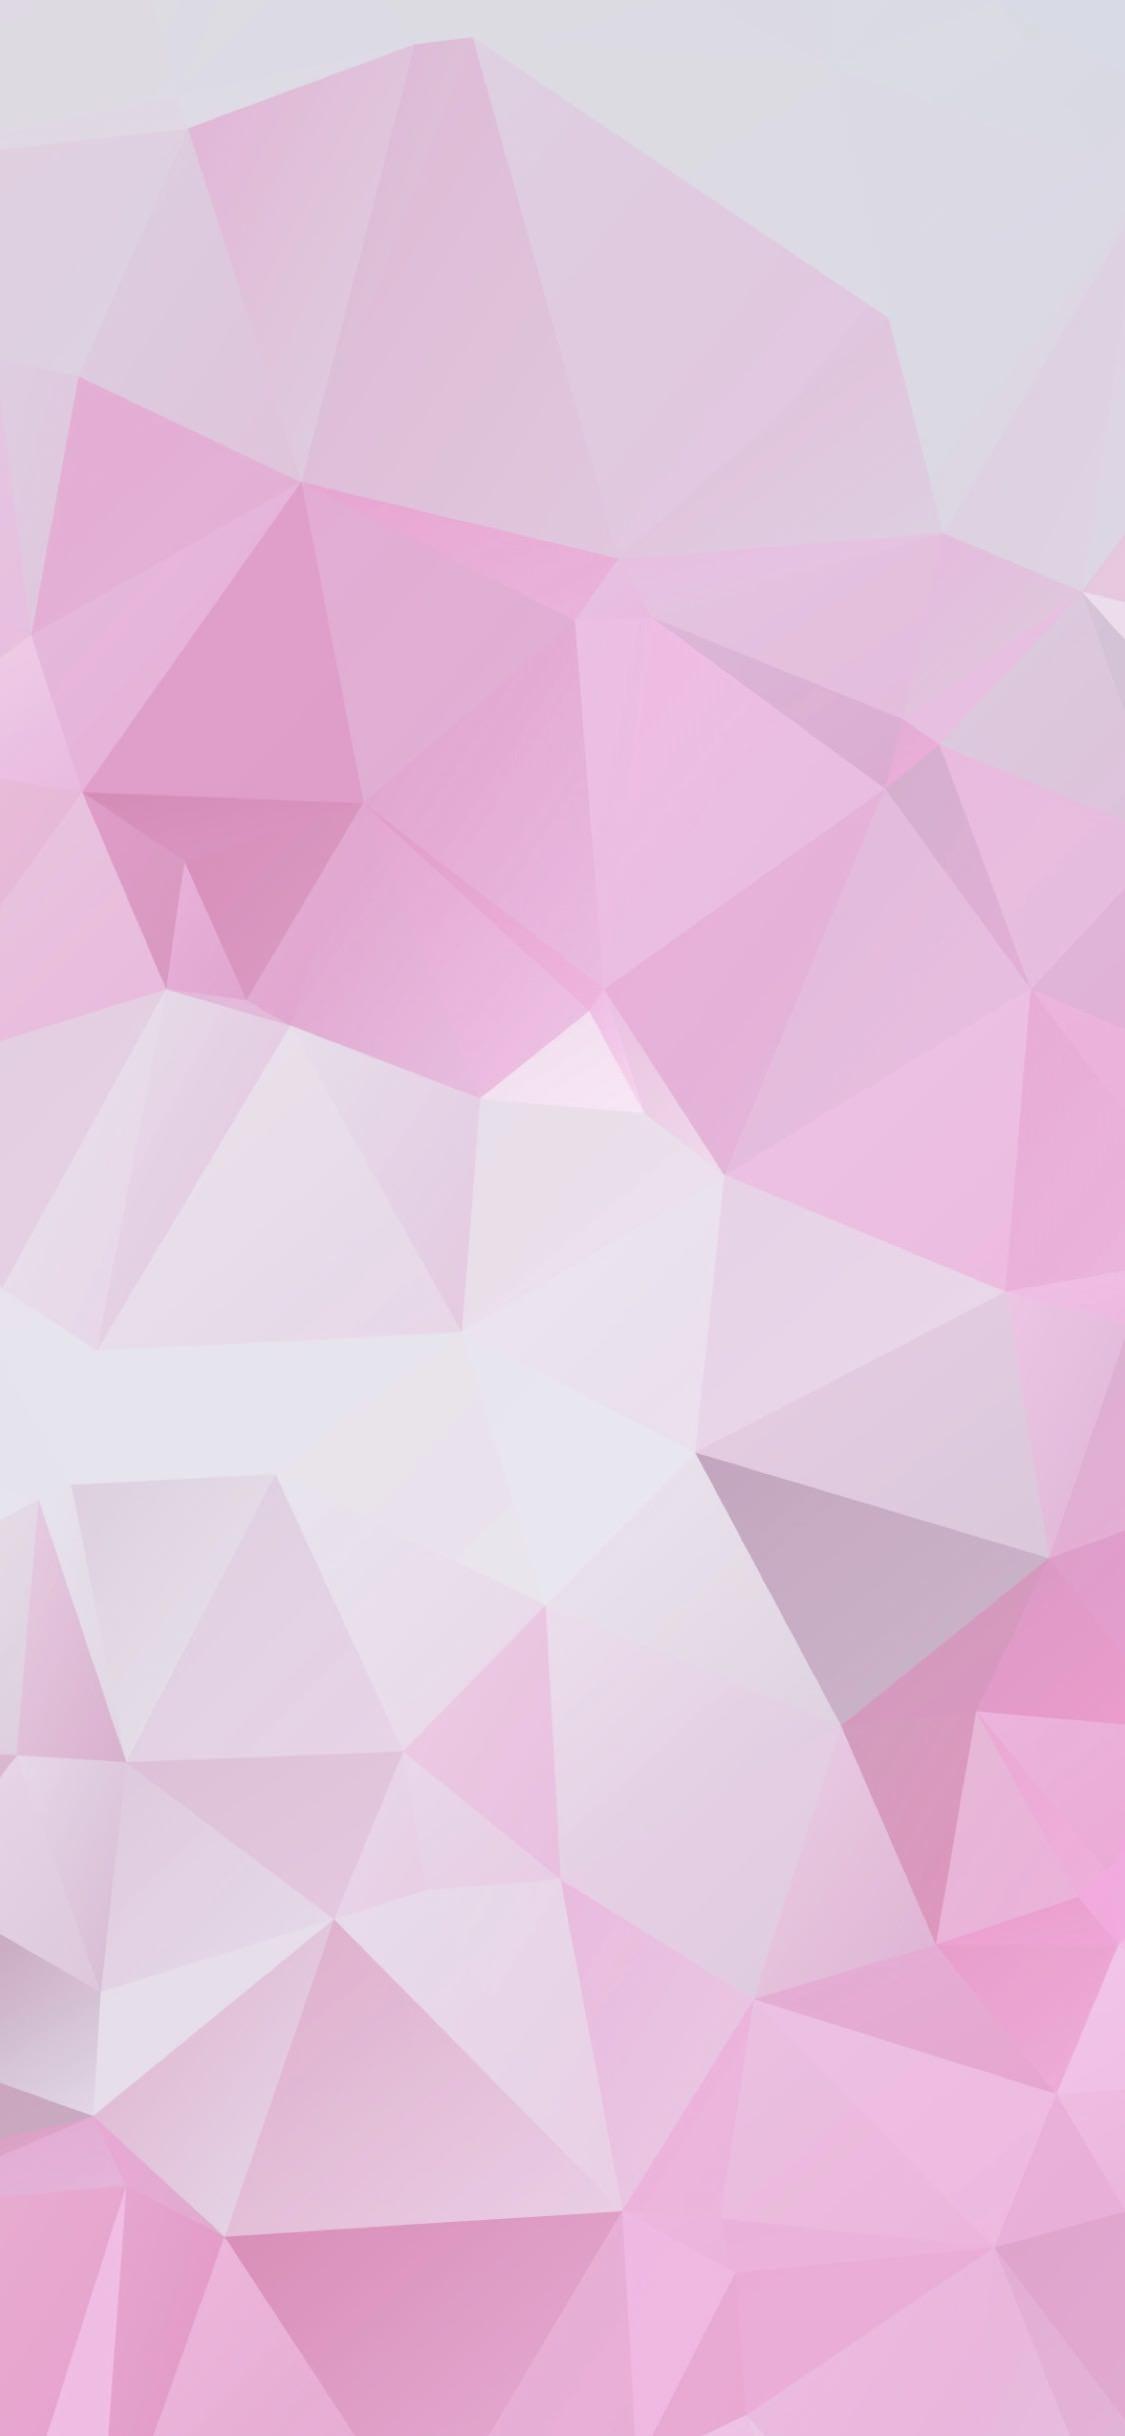 iPhone XS , iPhone X 壁紙 wallpaper 0672